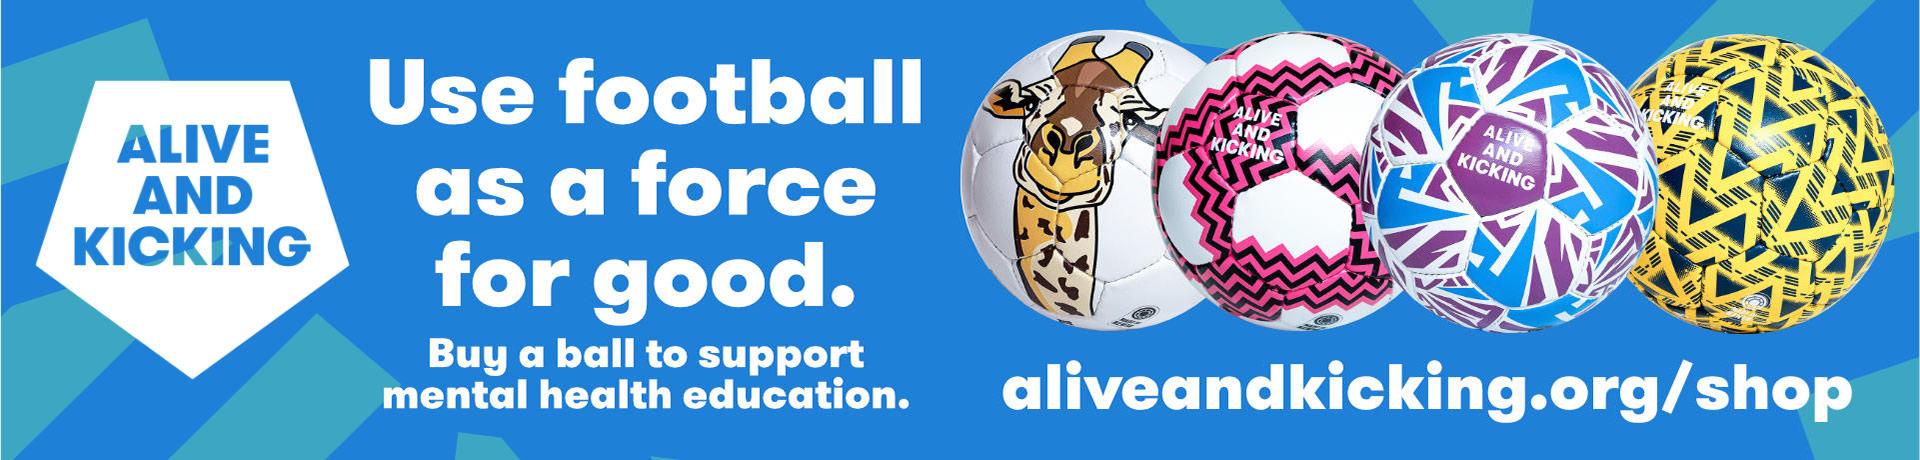 Alive & Kicking banner